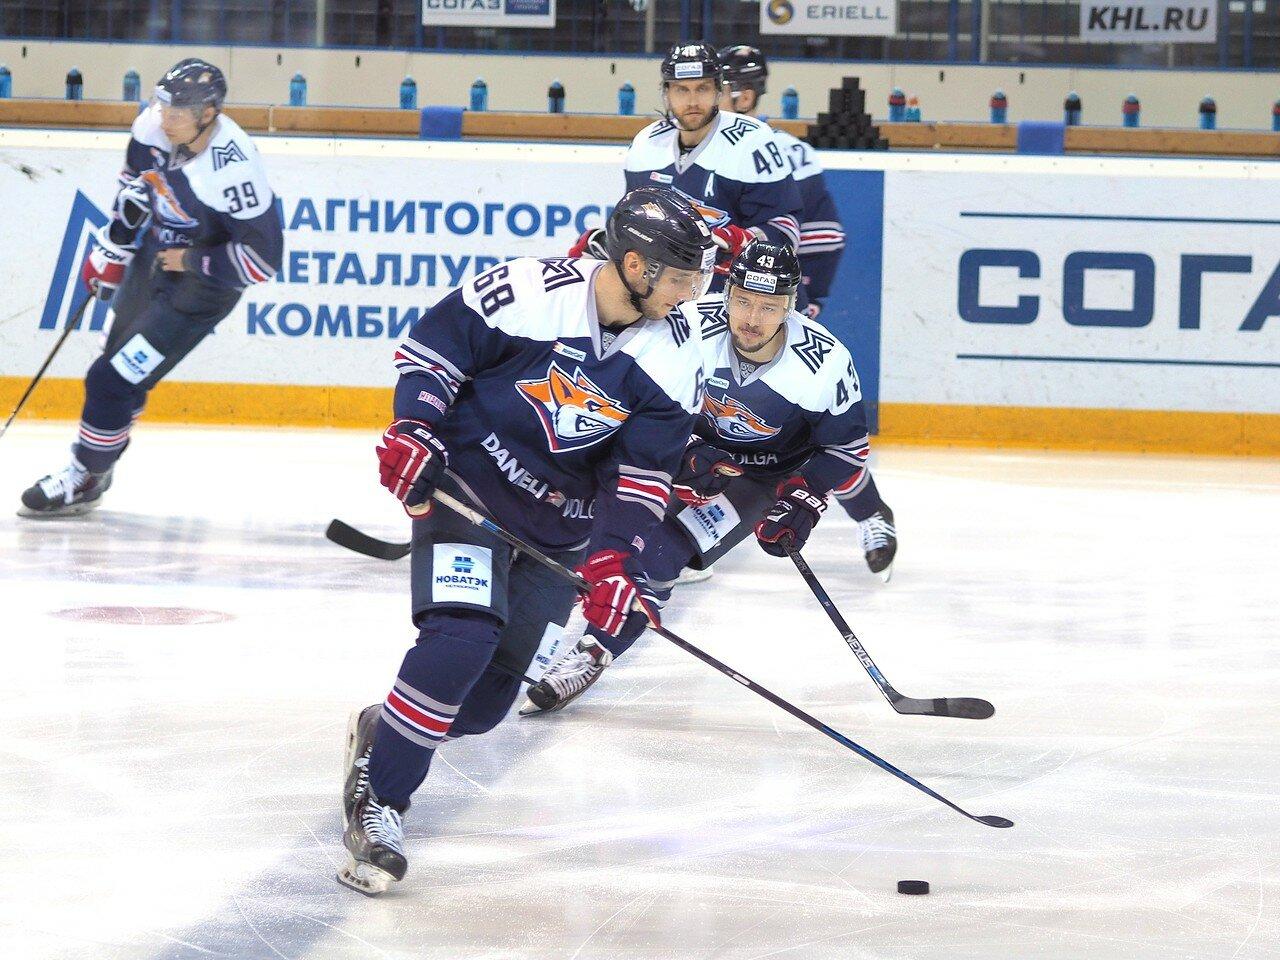 1Плей-офф 2016 Восток 1/2 Металлург - Сибирь 10.03.2016